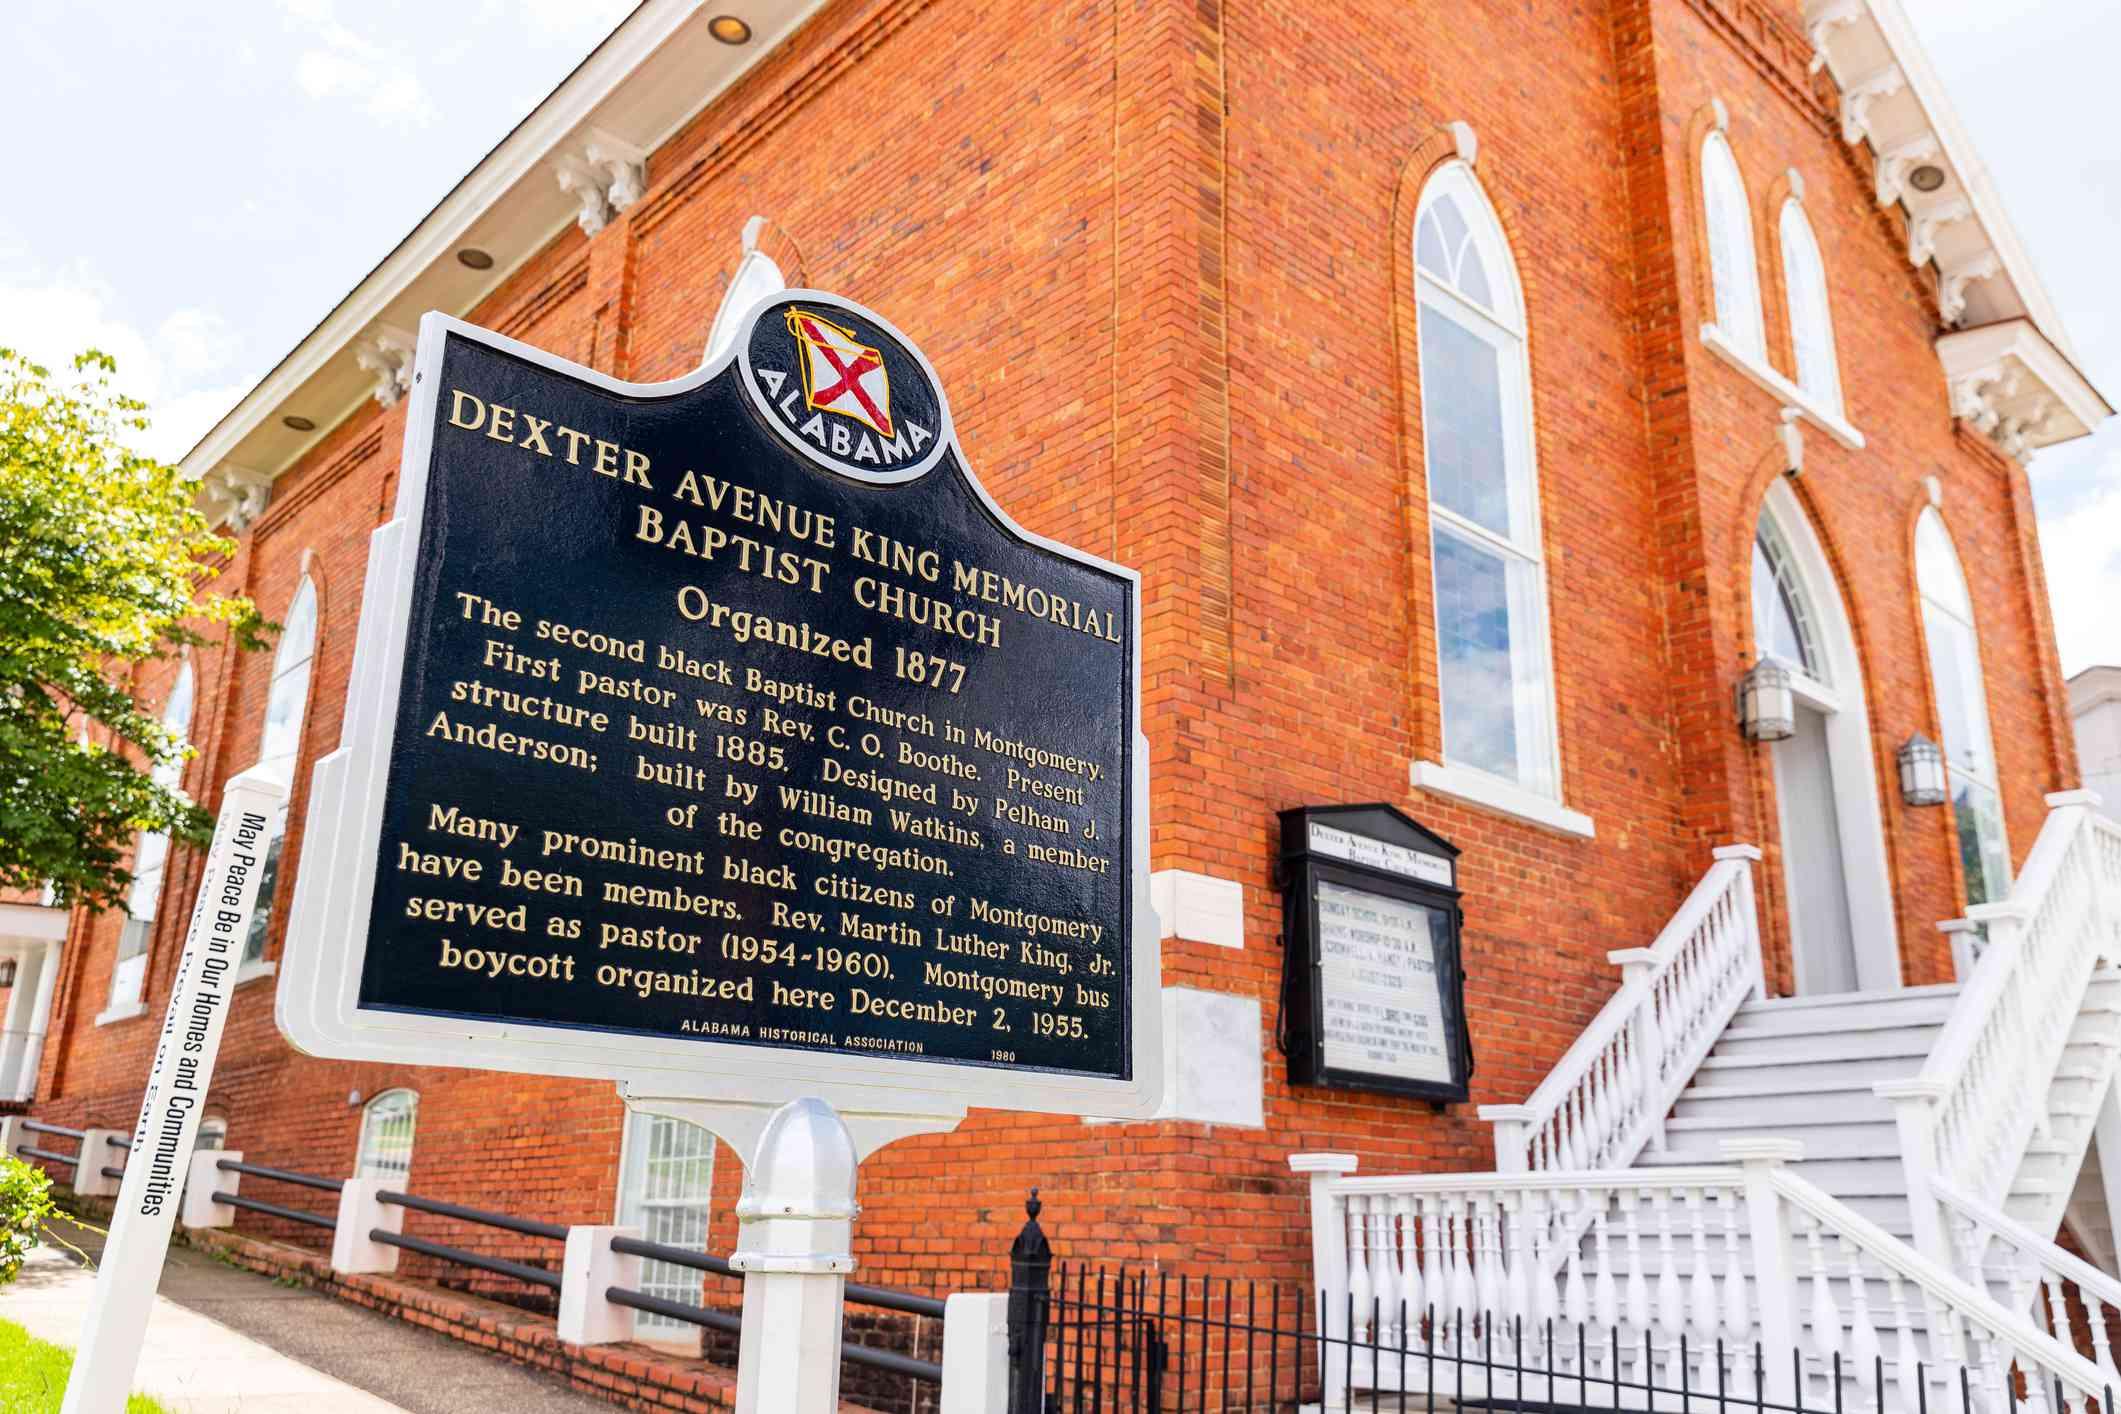 Dexter Avenue King Memorial Baptist Church in Montgomery Alabama